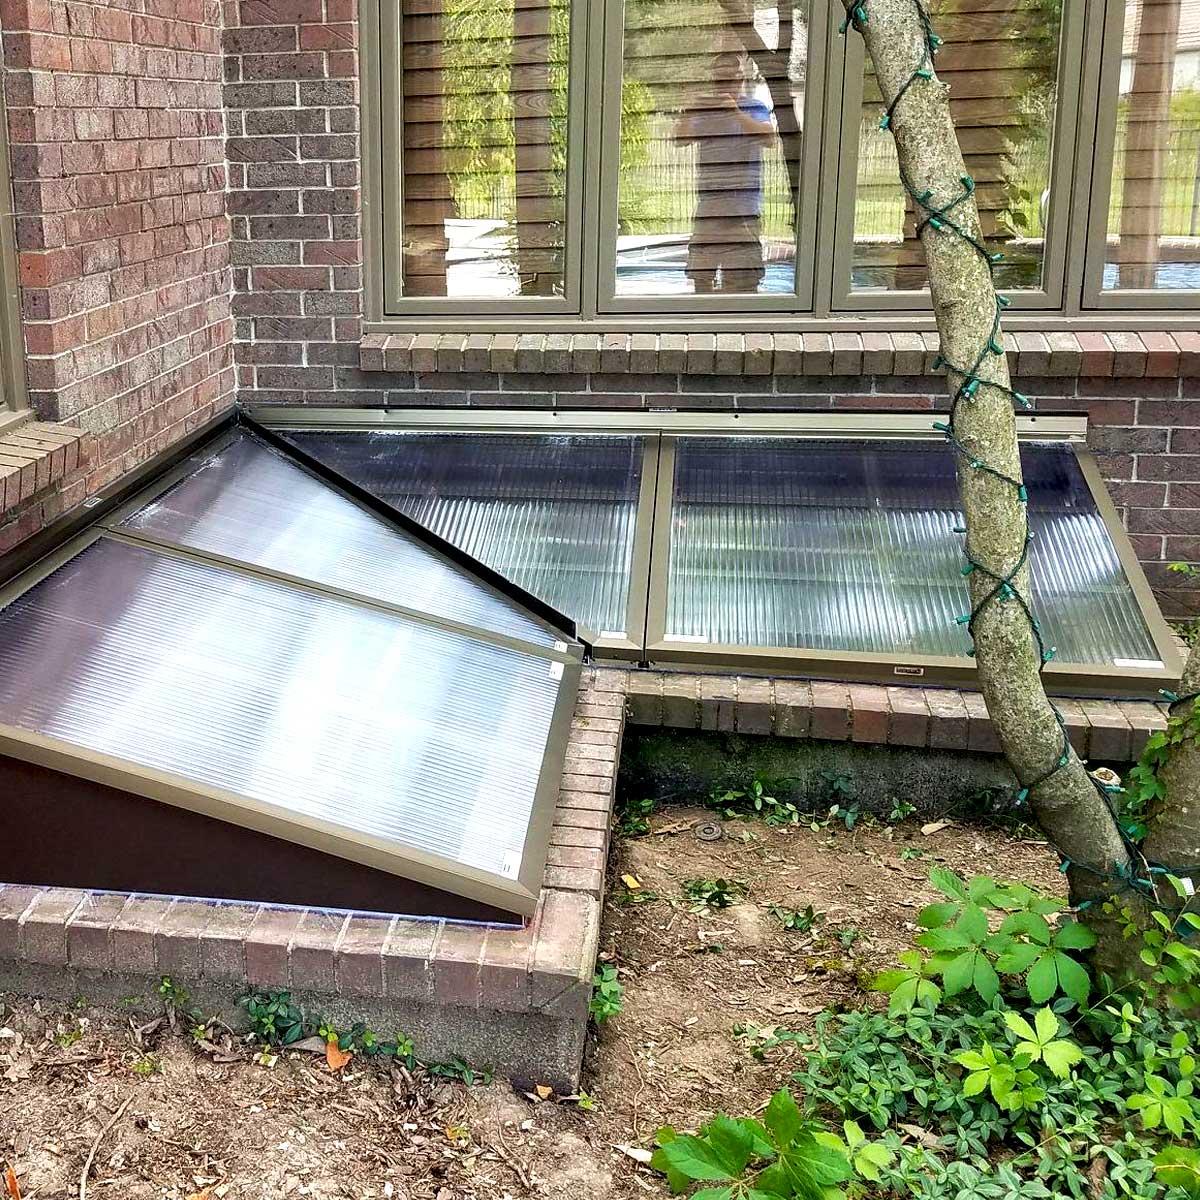 Lustercraft Egress Window Well Cover